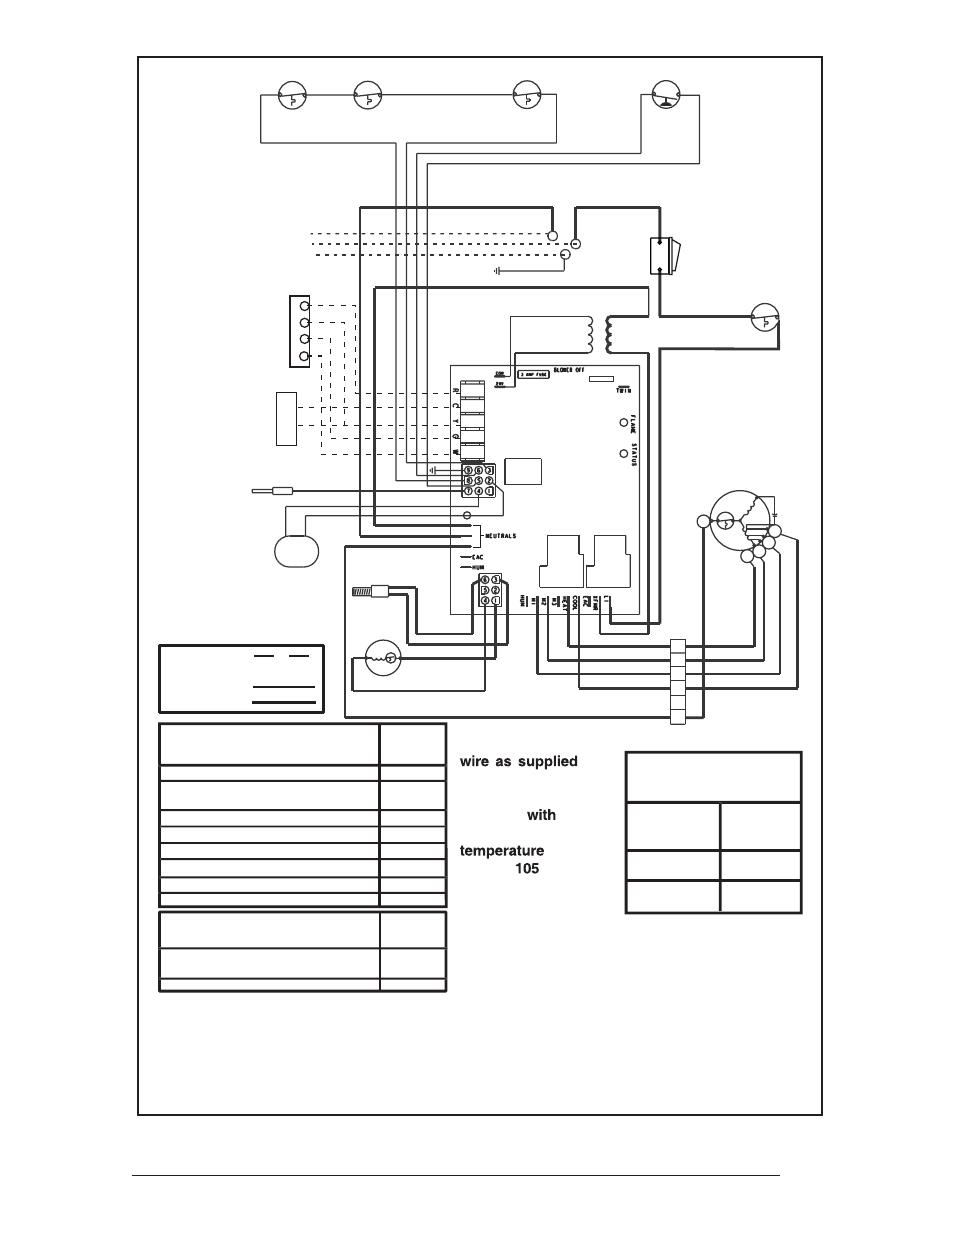 medium resolution of 33 figure 30 downflow furnace wiring diagram legend nordyne33 figure 30 downflow furnace wiring diagram